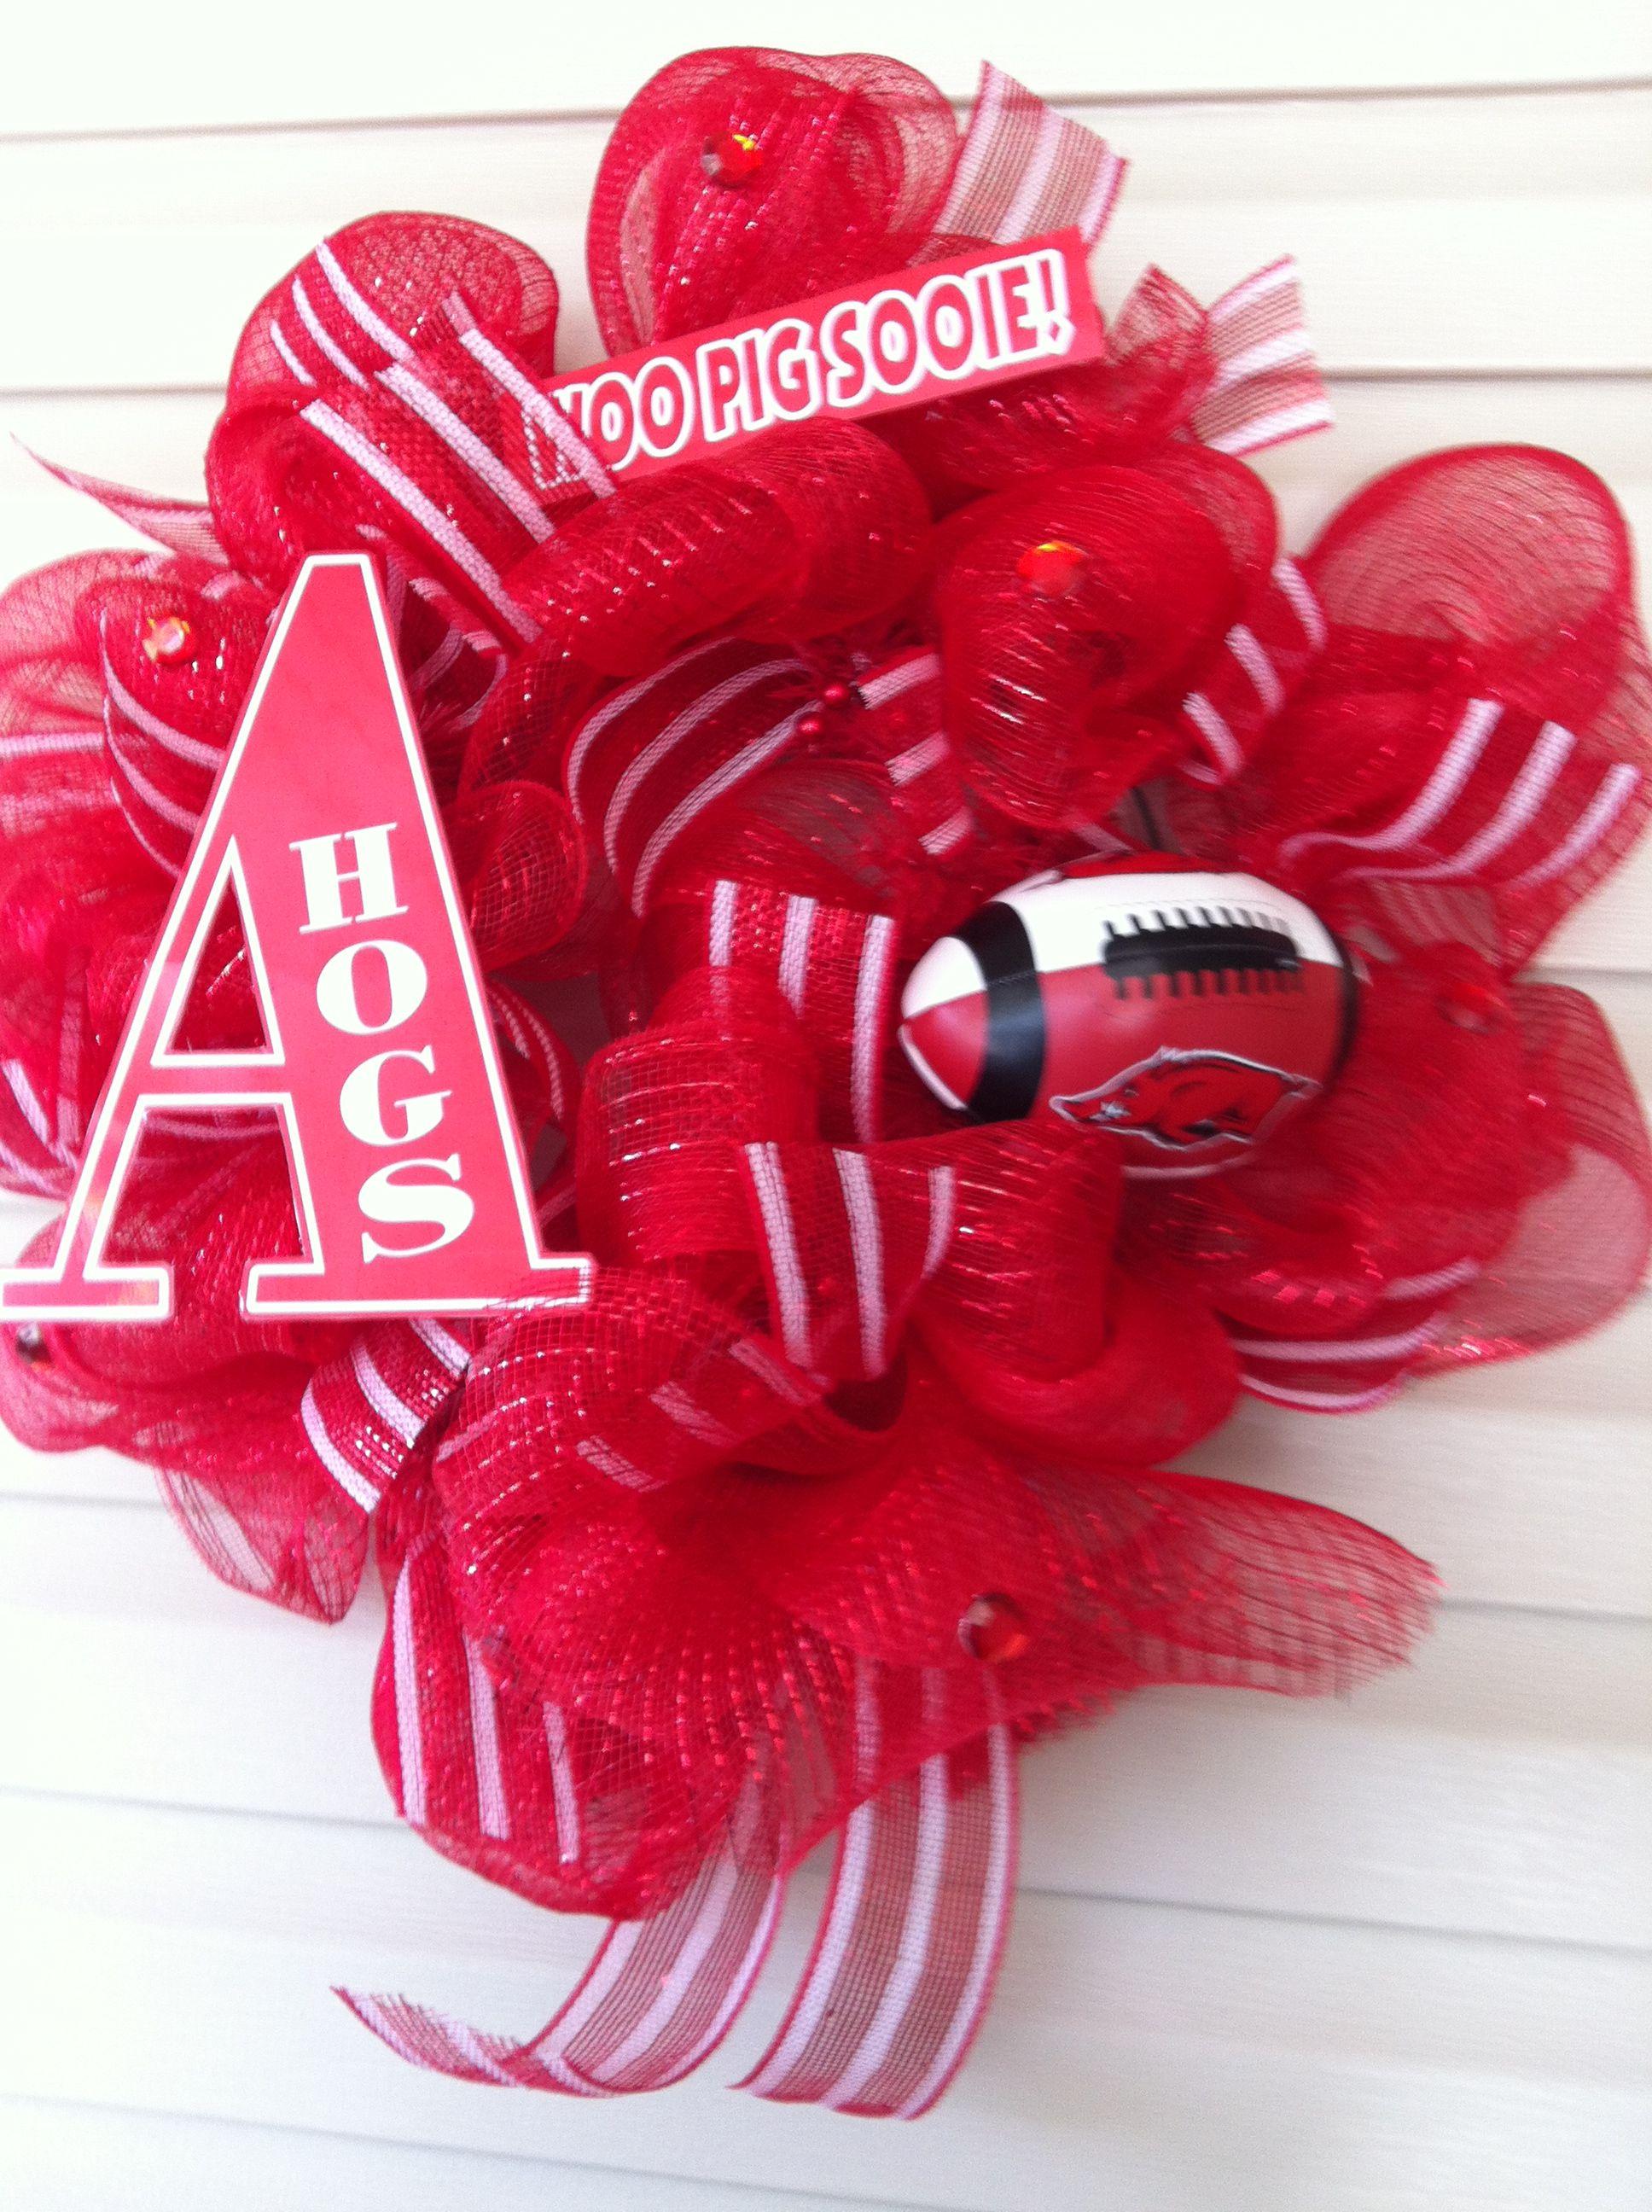 Football season is coming! Go Hogs!